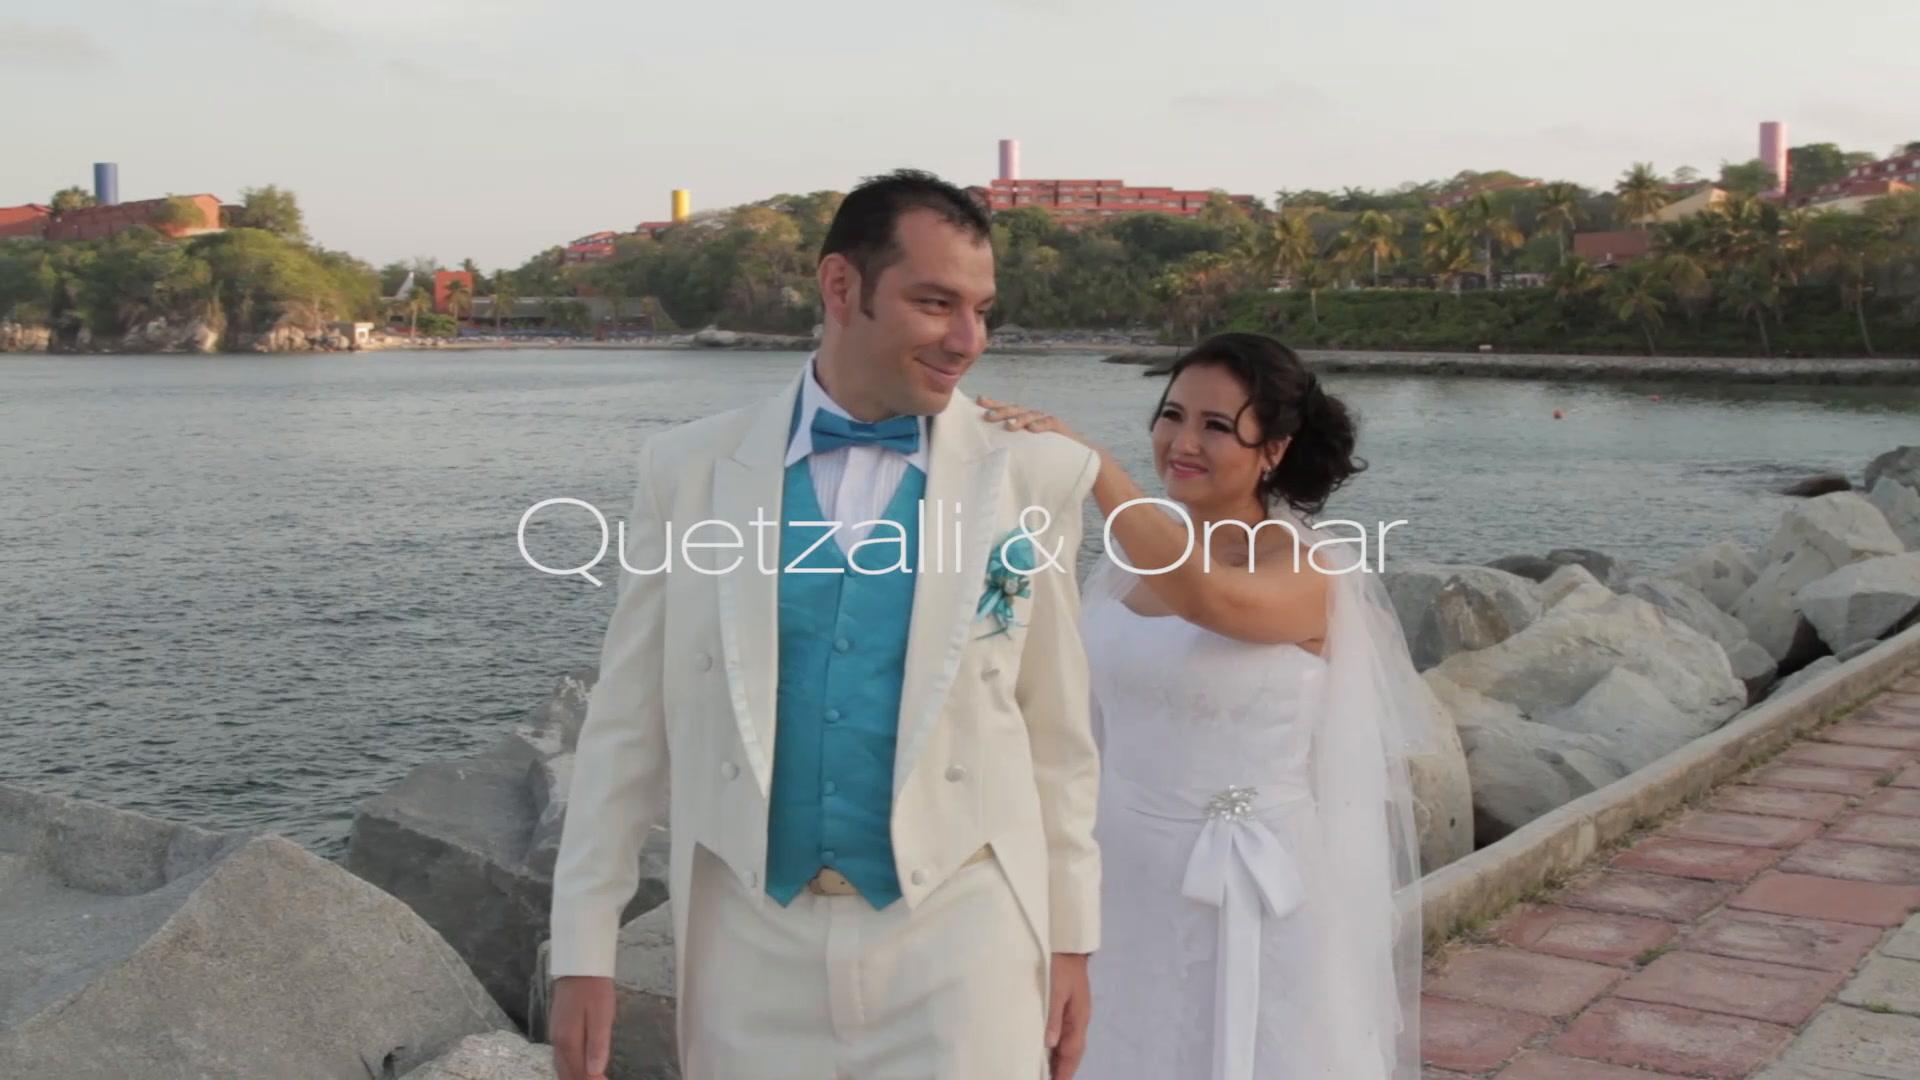 Quetzalli + Omar   La Crucecita, Mexico   a beach